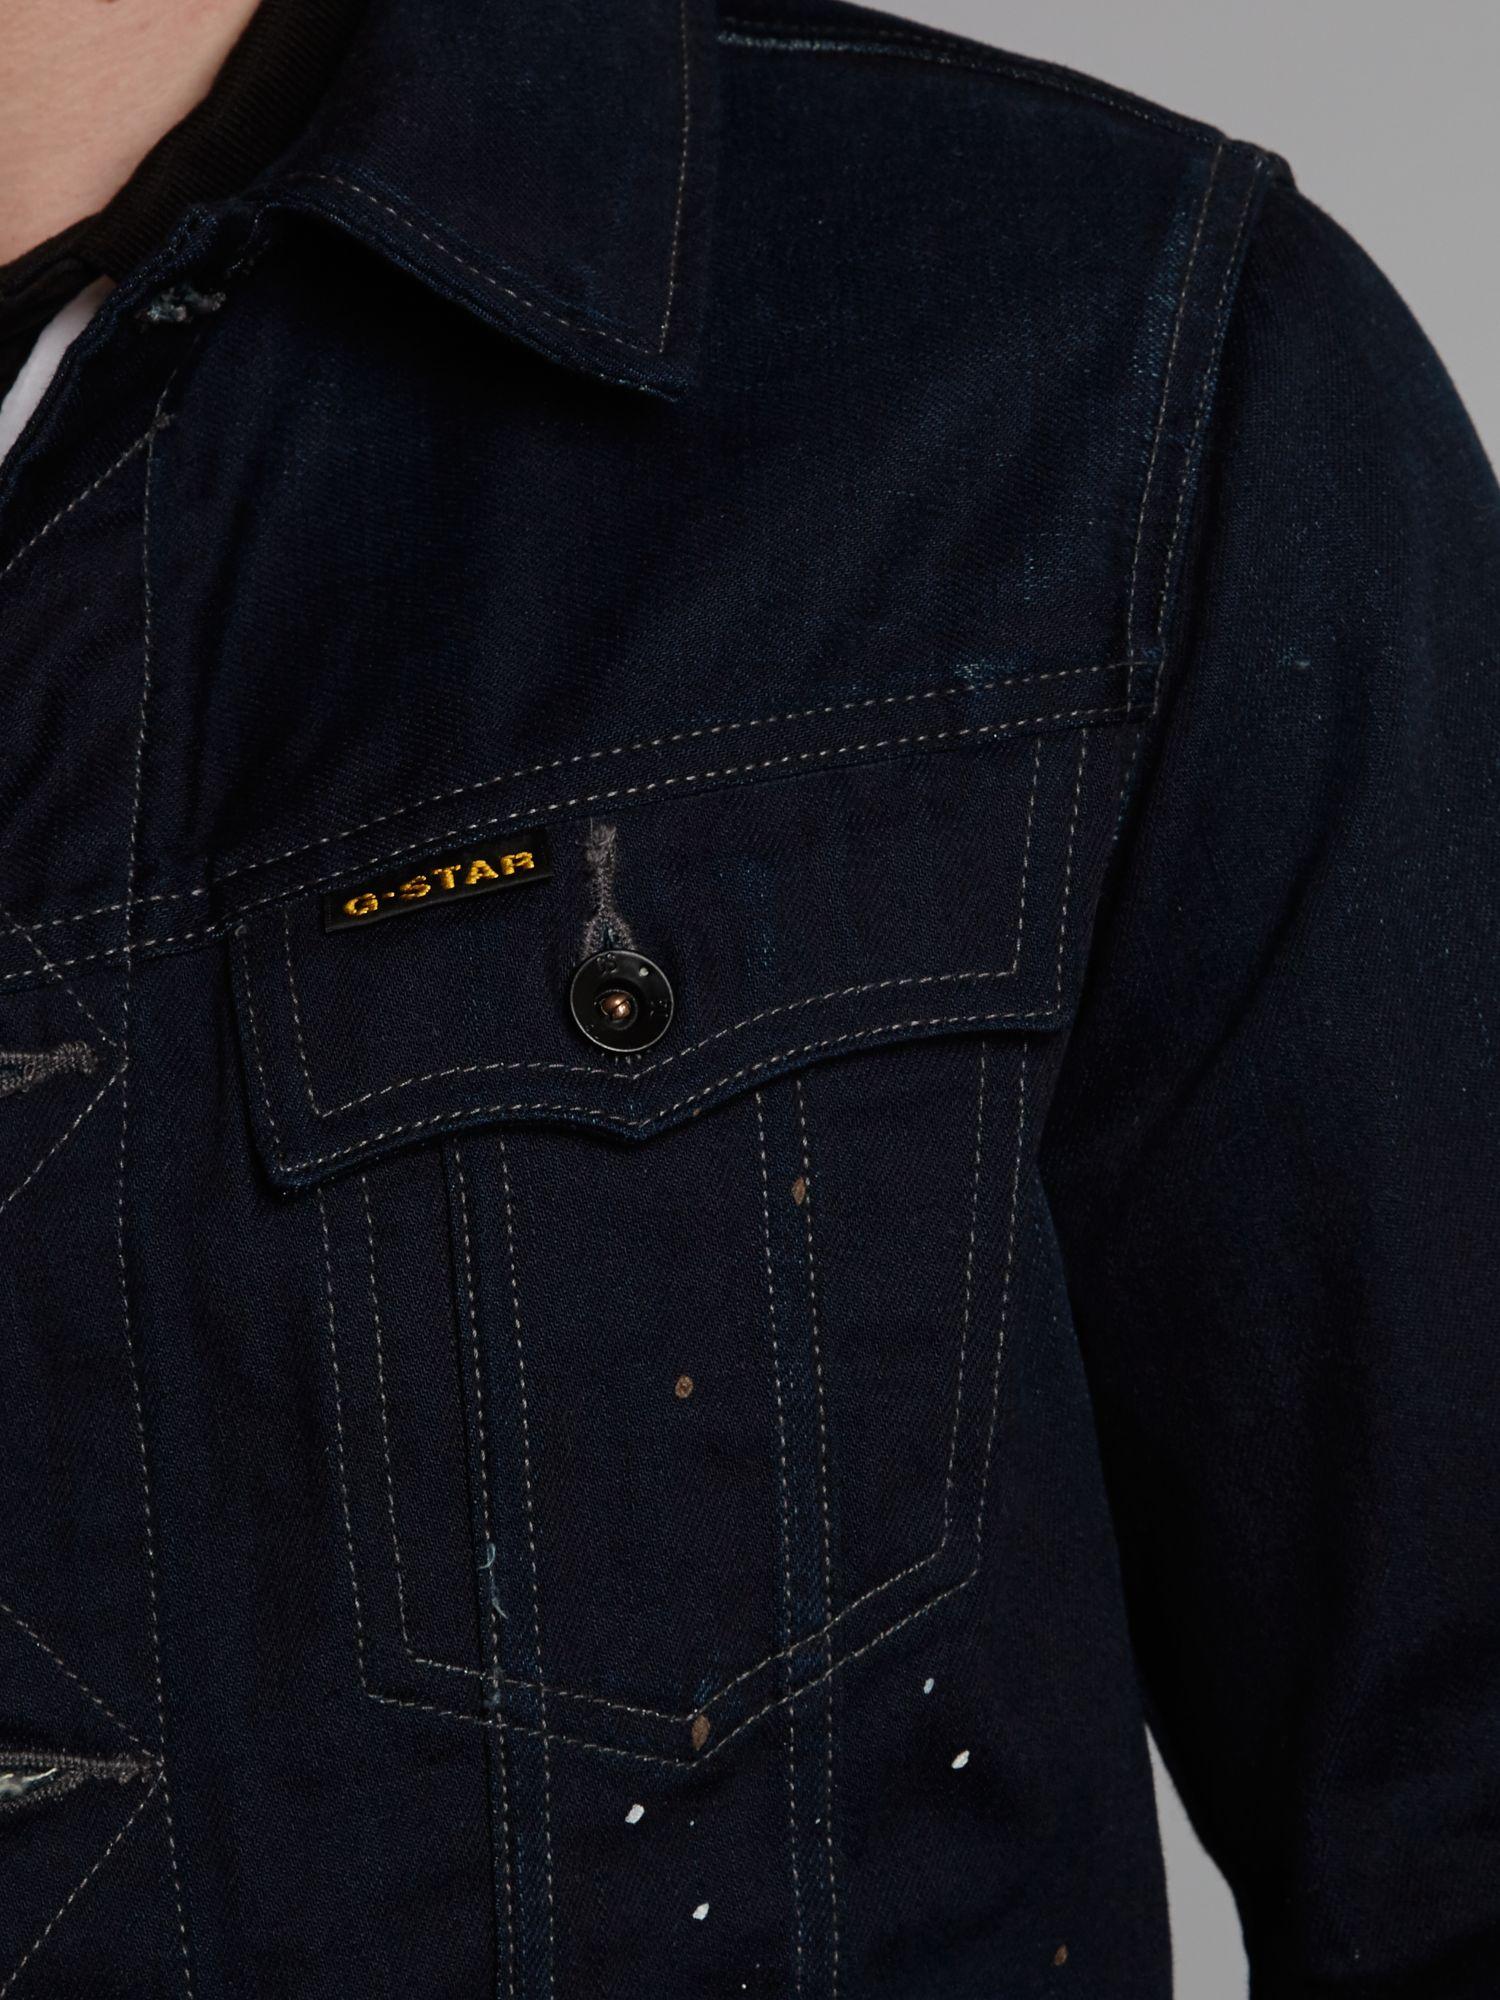 star raw denim raw slim tailor denim jacket product 4 12028533. Black Bedroom Furniture Sets. Home Design Ideas